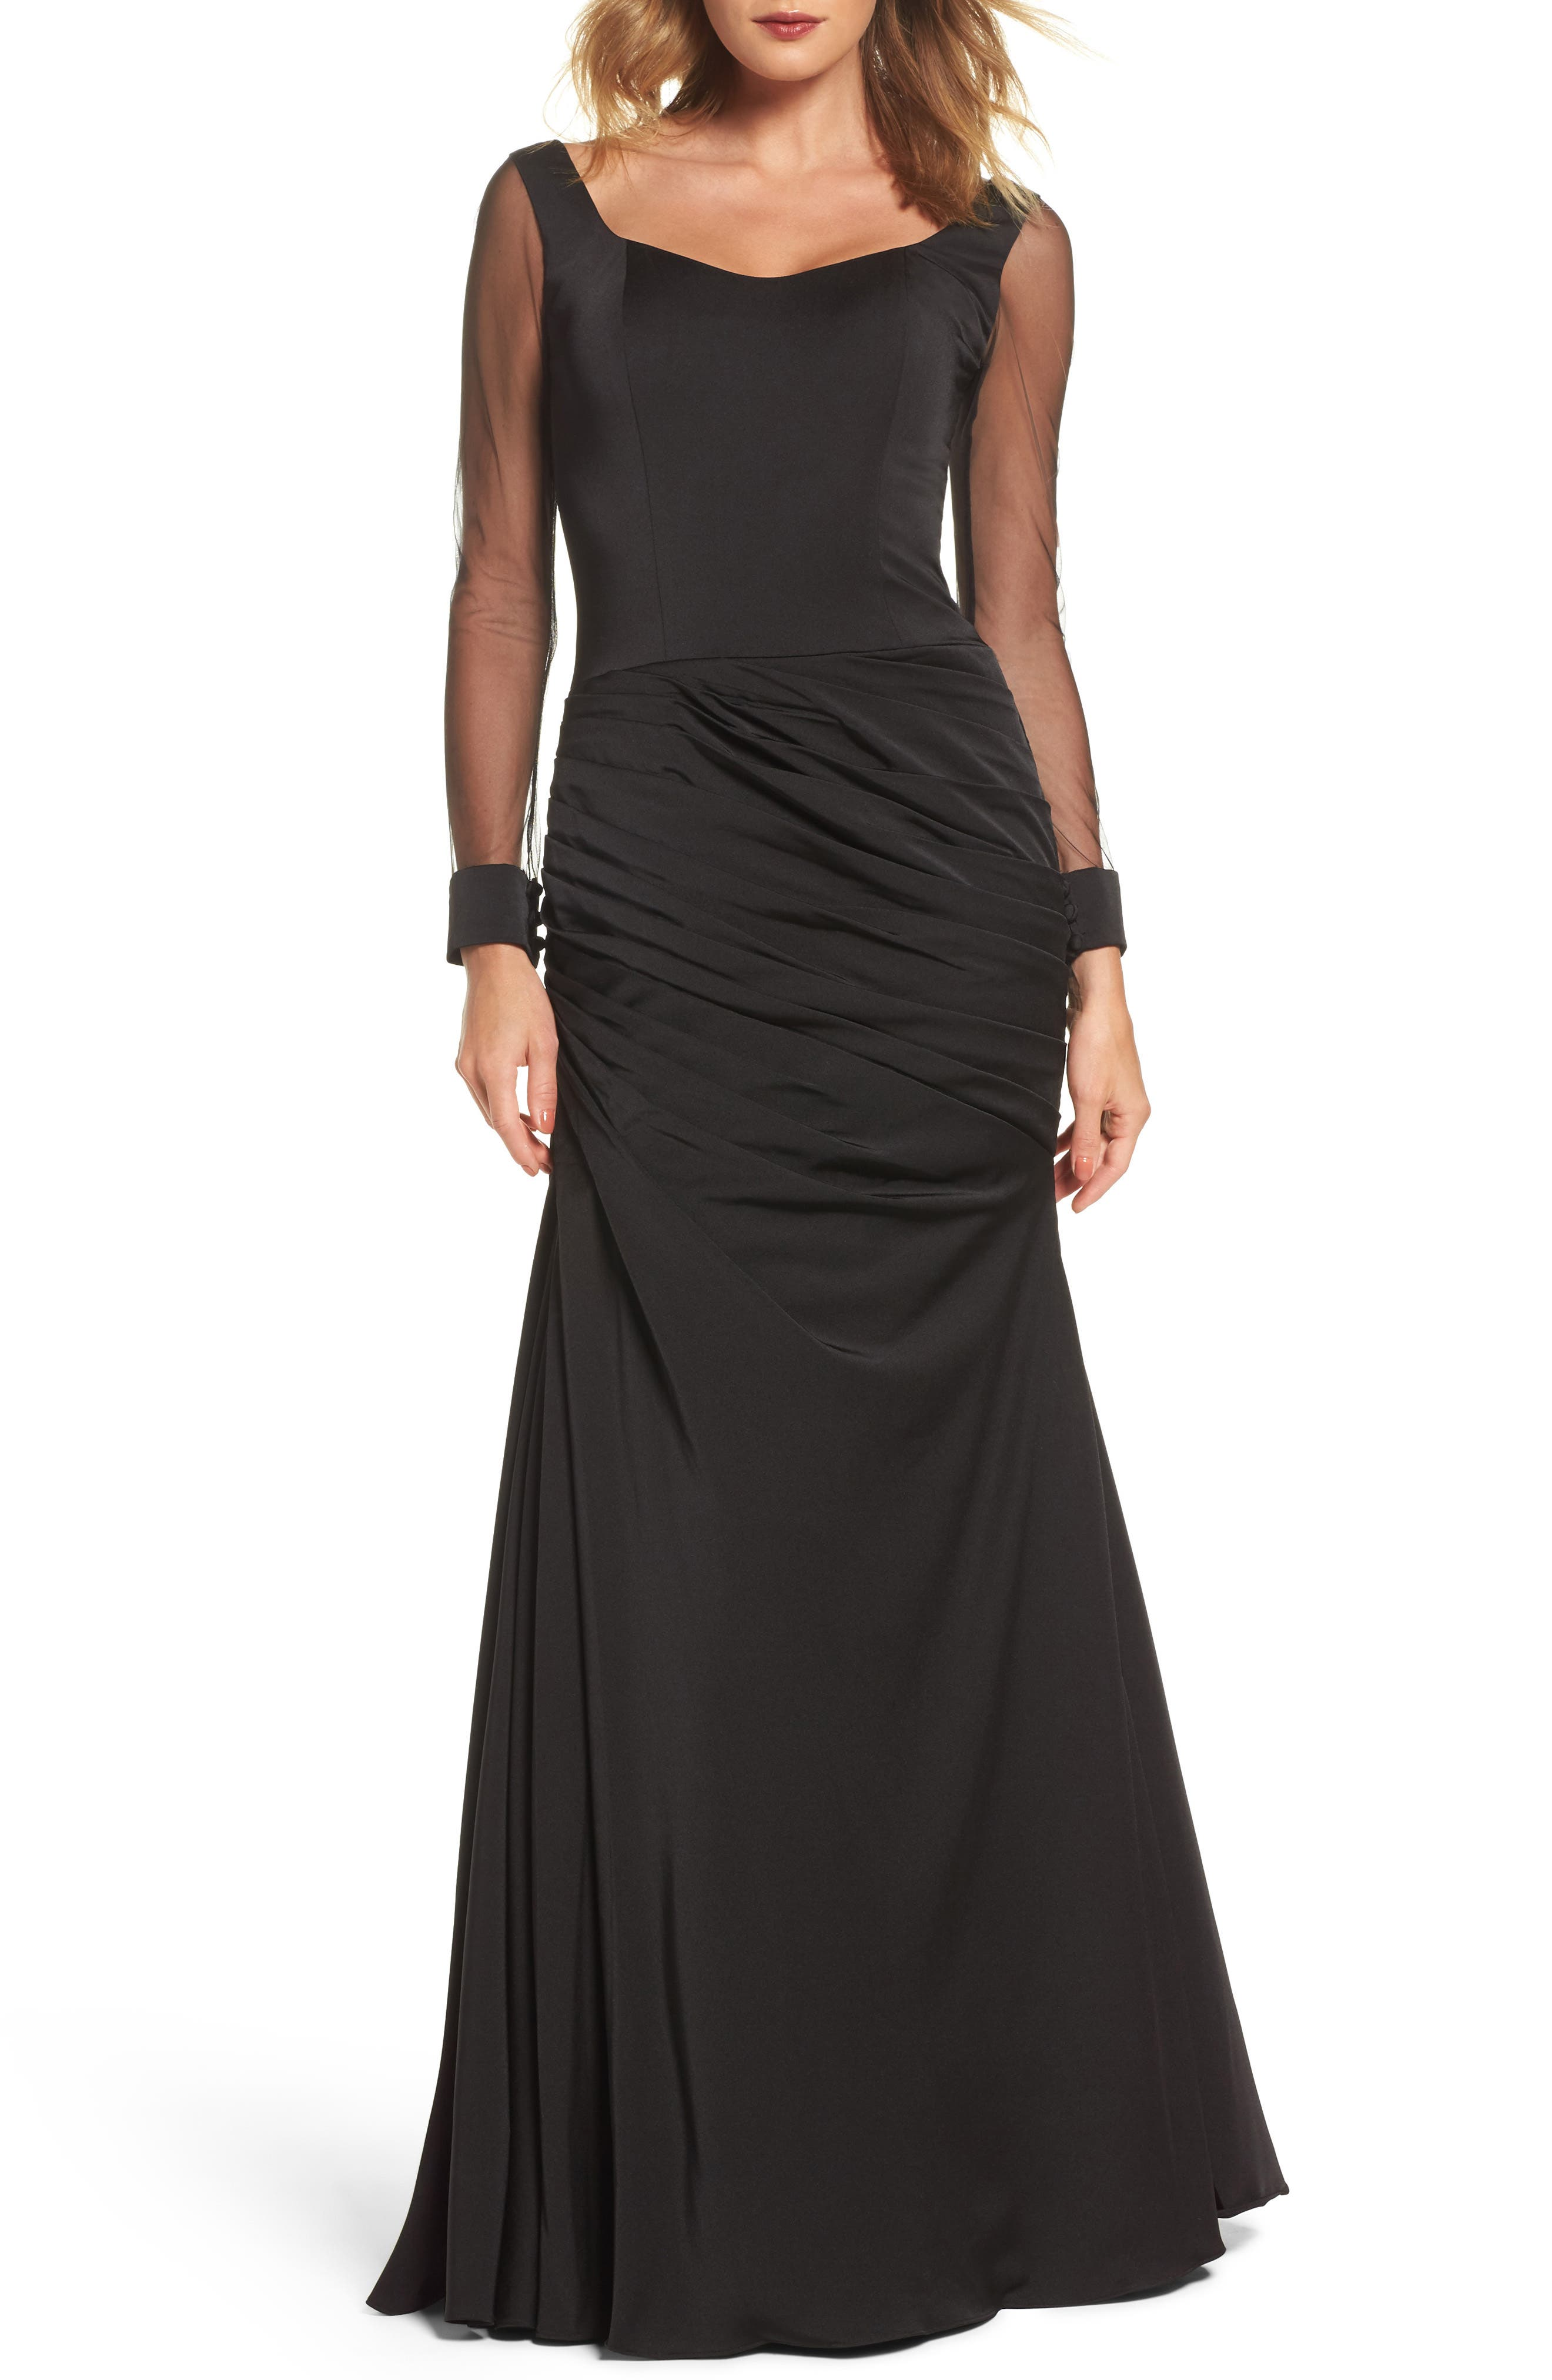 LA FEMME, Sheer Sleeve Gown, Main thumbnail 1, color, BLACK